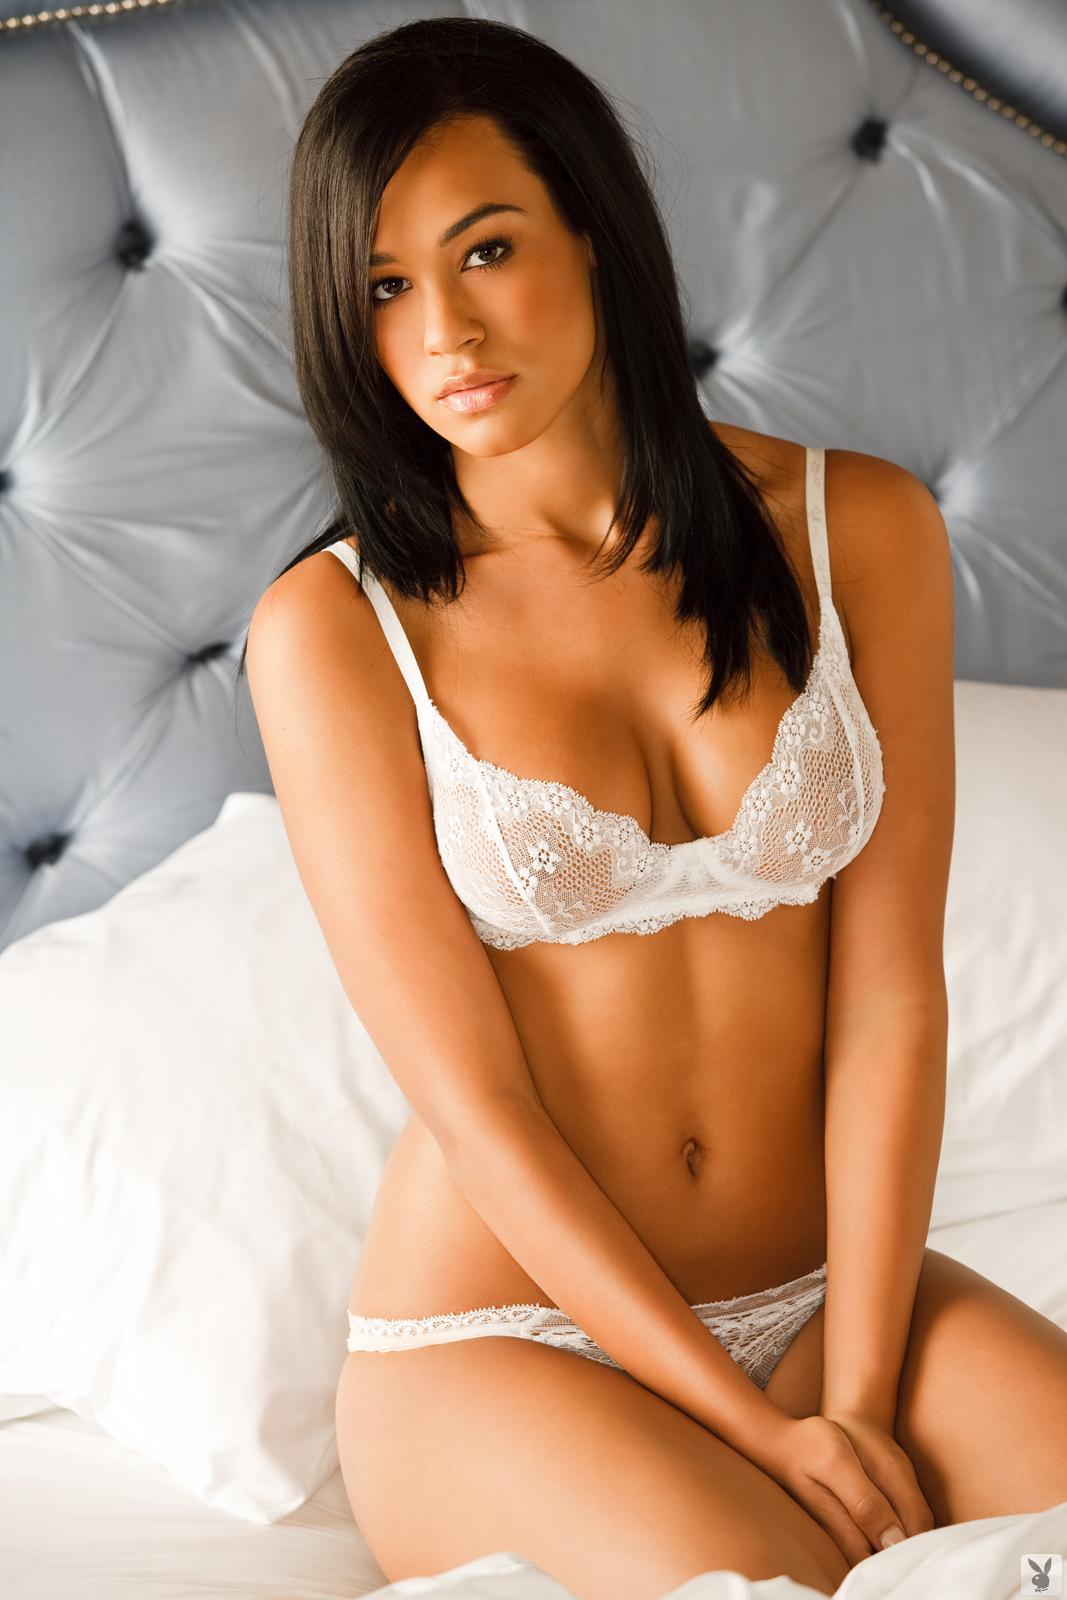 Andrea Leilani in lingerie